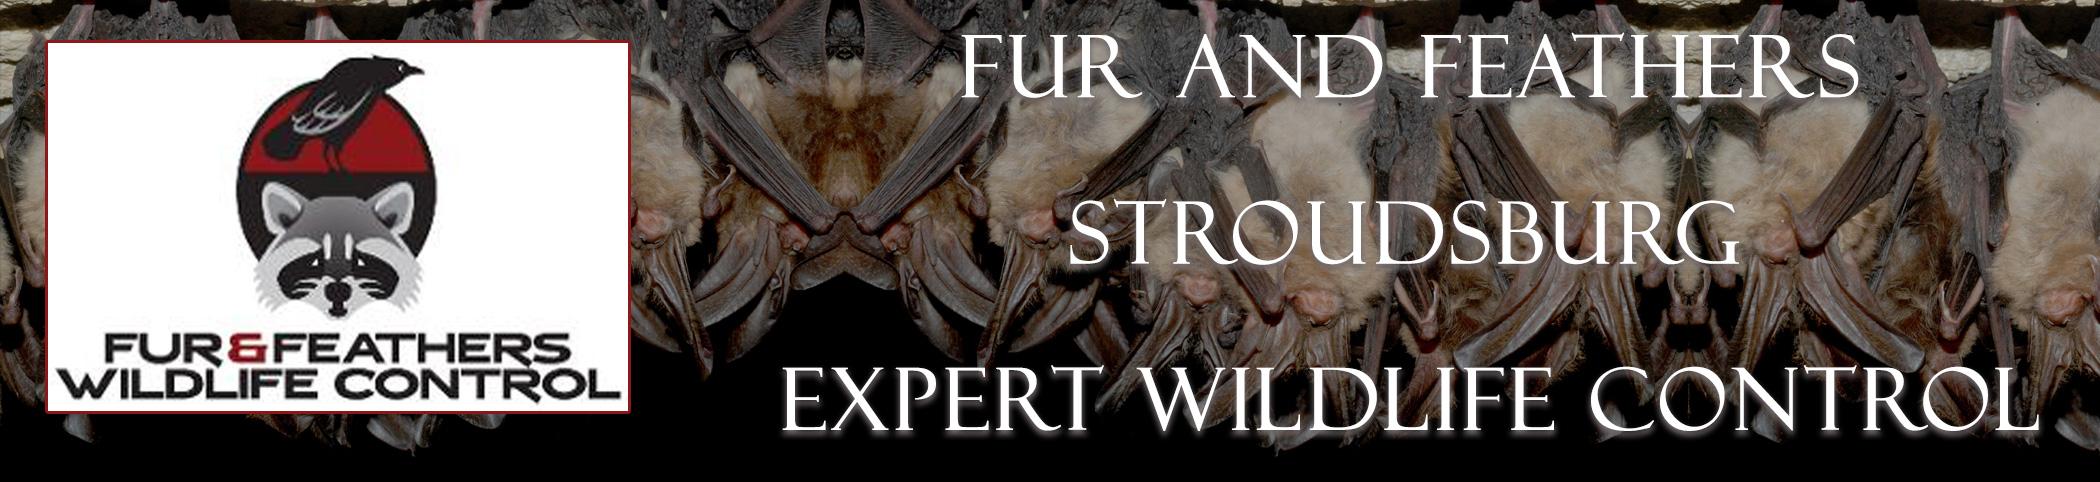 bat exclusion u0026 control company in stroudsburg pa bat removal pro